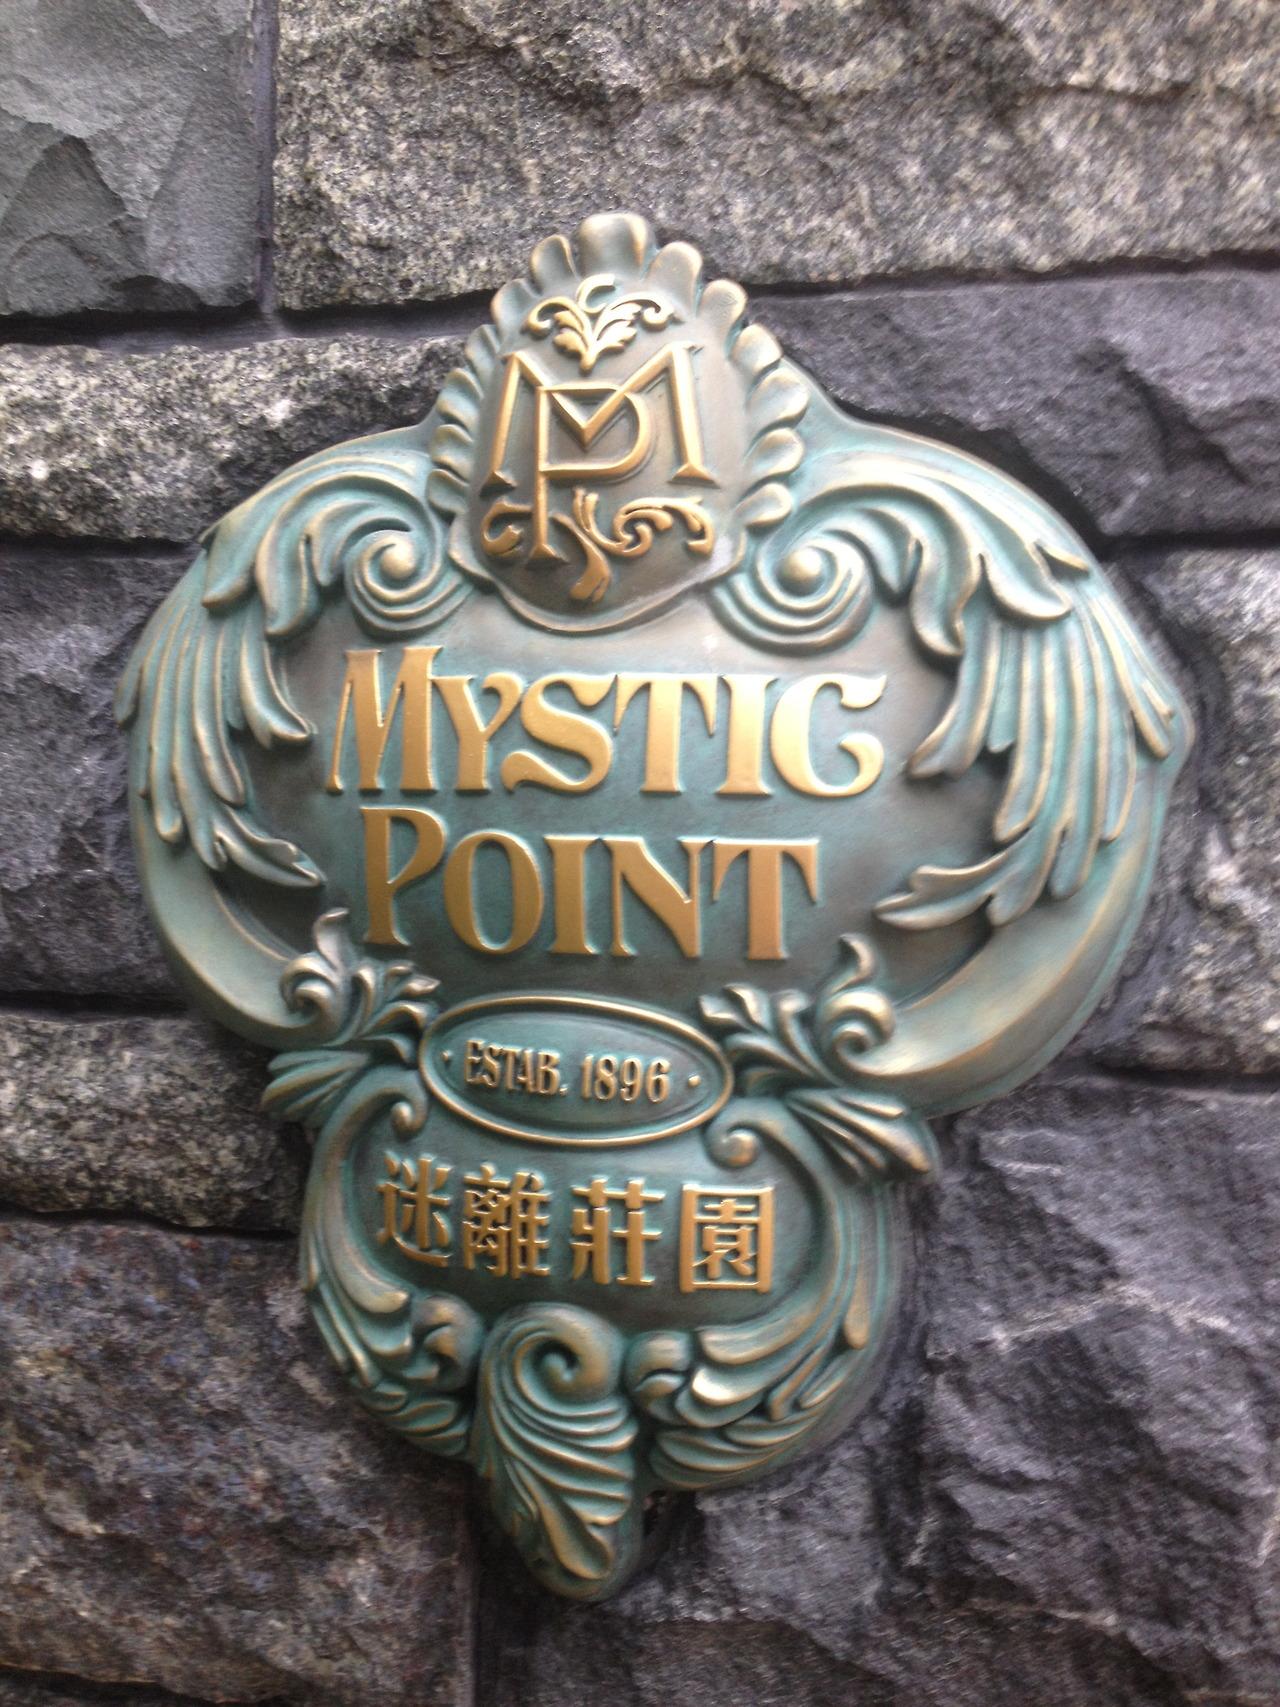 Mystic Manor Hong Kong Disneyland Mystic Point Haunted Mansion Walt Disney Imagineering Society of Explorers and Adventurers Lord Henry Mystic Albert monkey